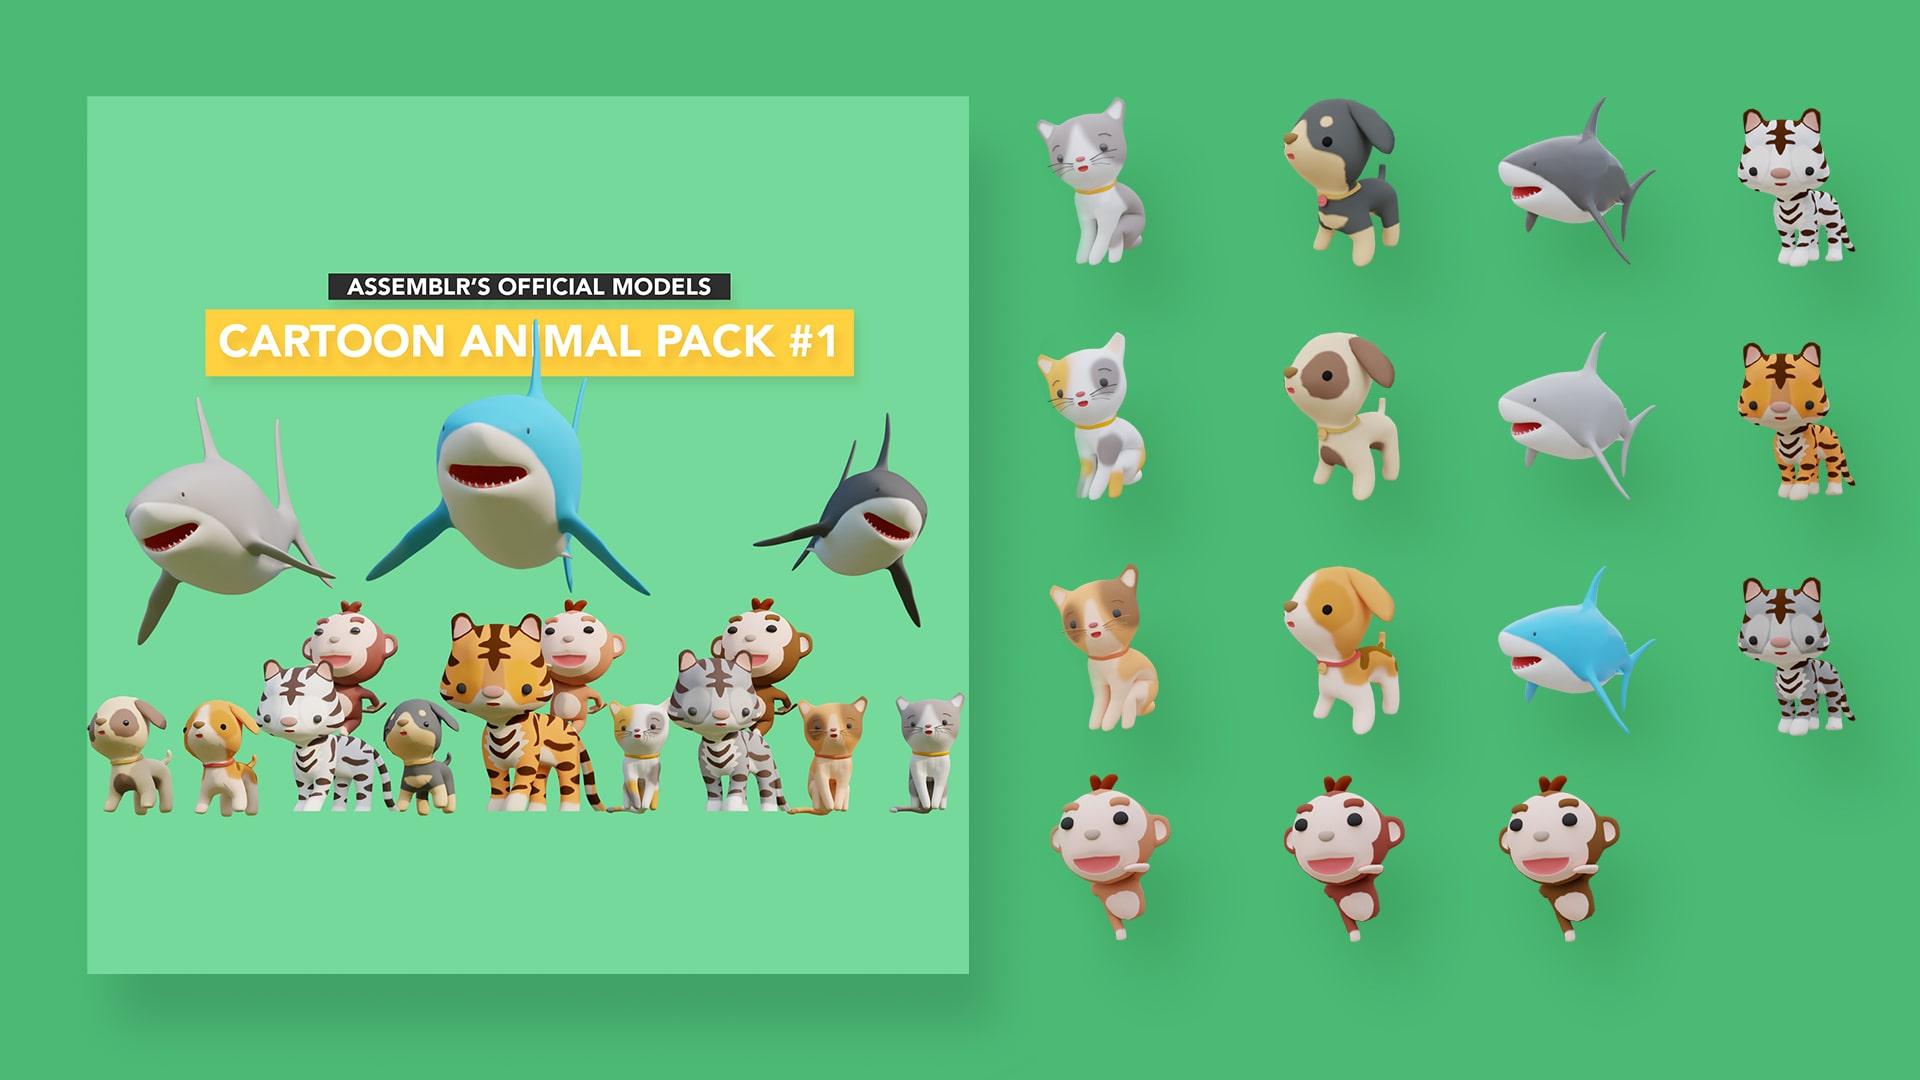 Cartoon animal pack #1